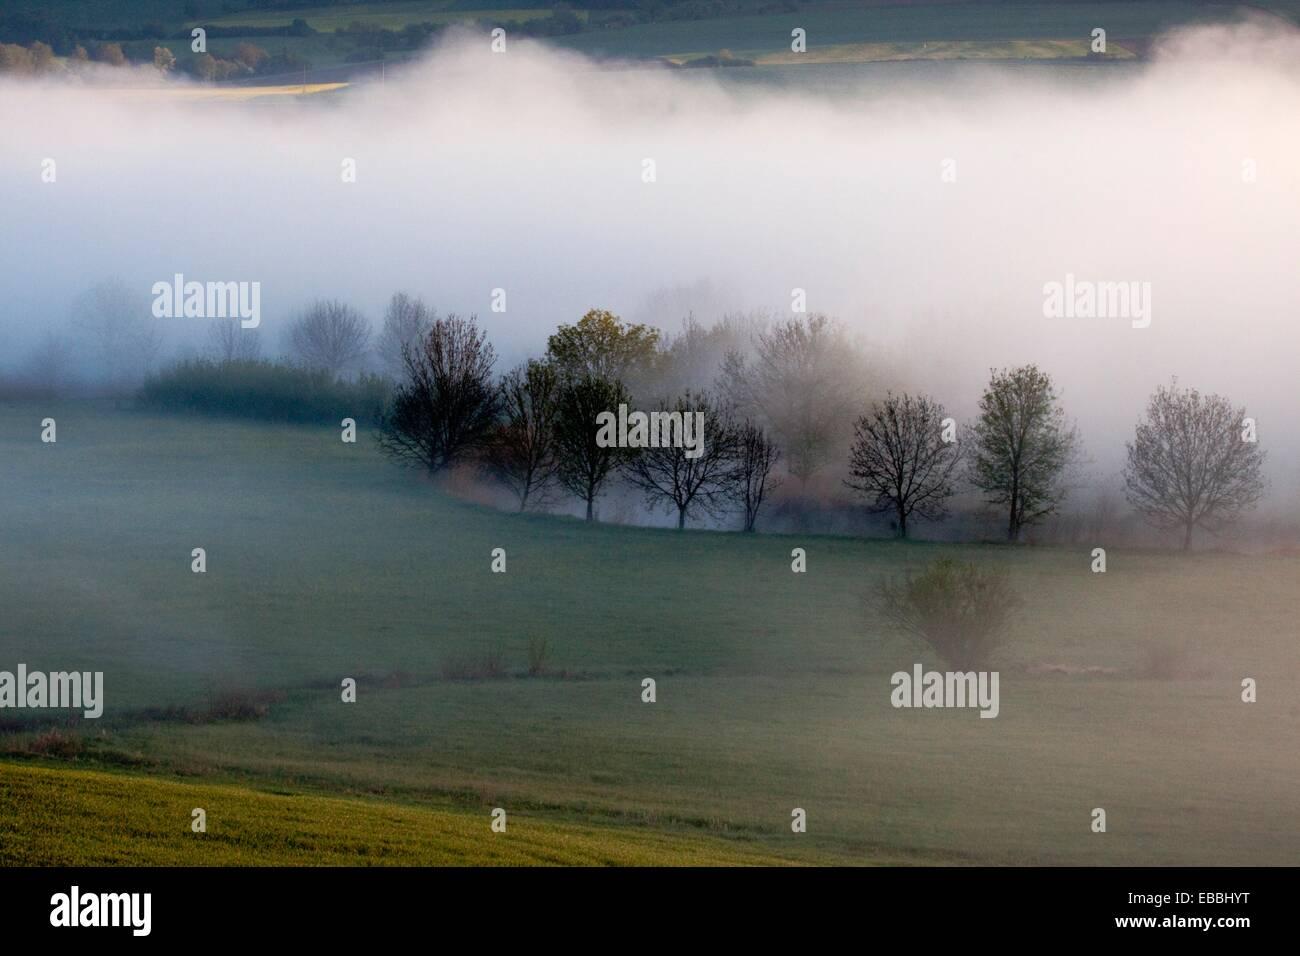 Trees line the bank of the Wörnitz river in morning fog - Region Hesselberg, Bavaria/Germany. Stock Photo